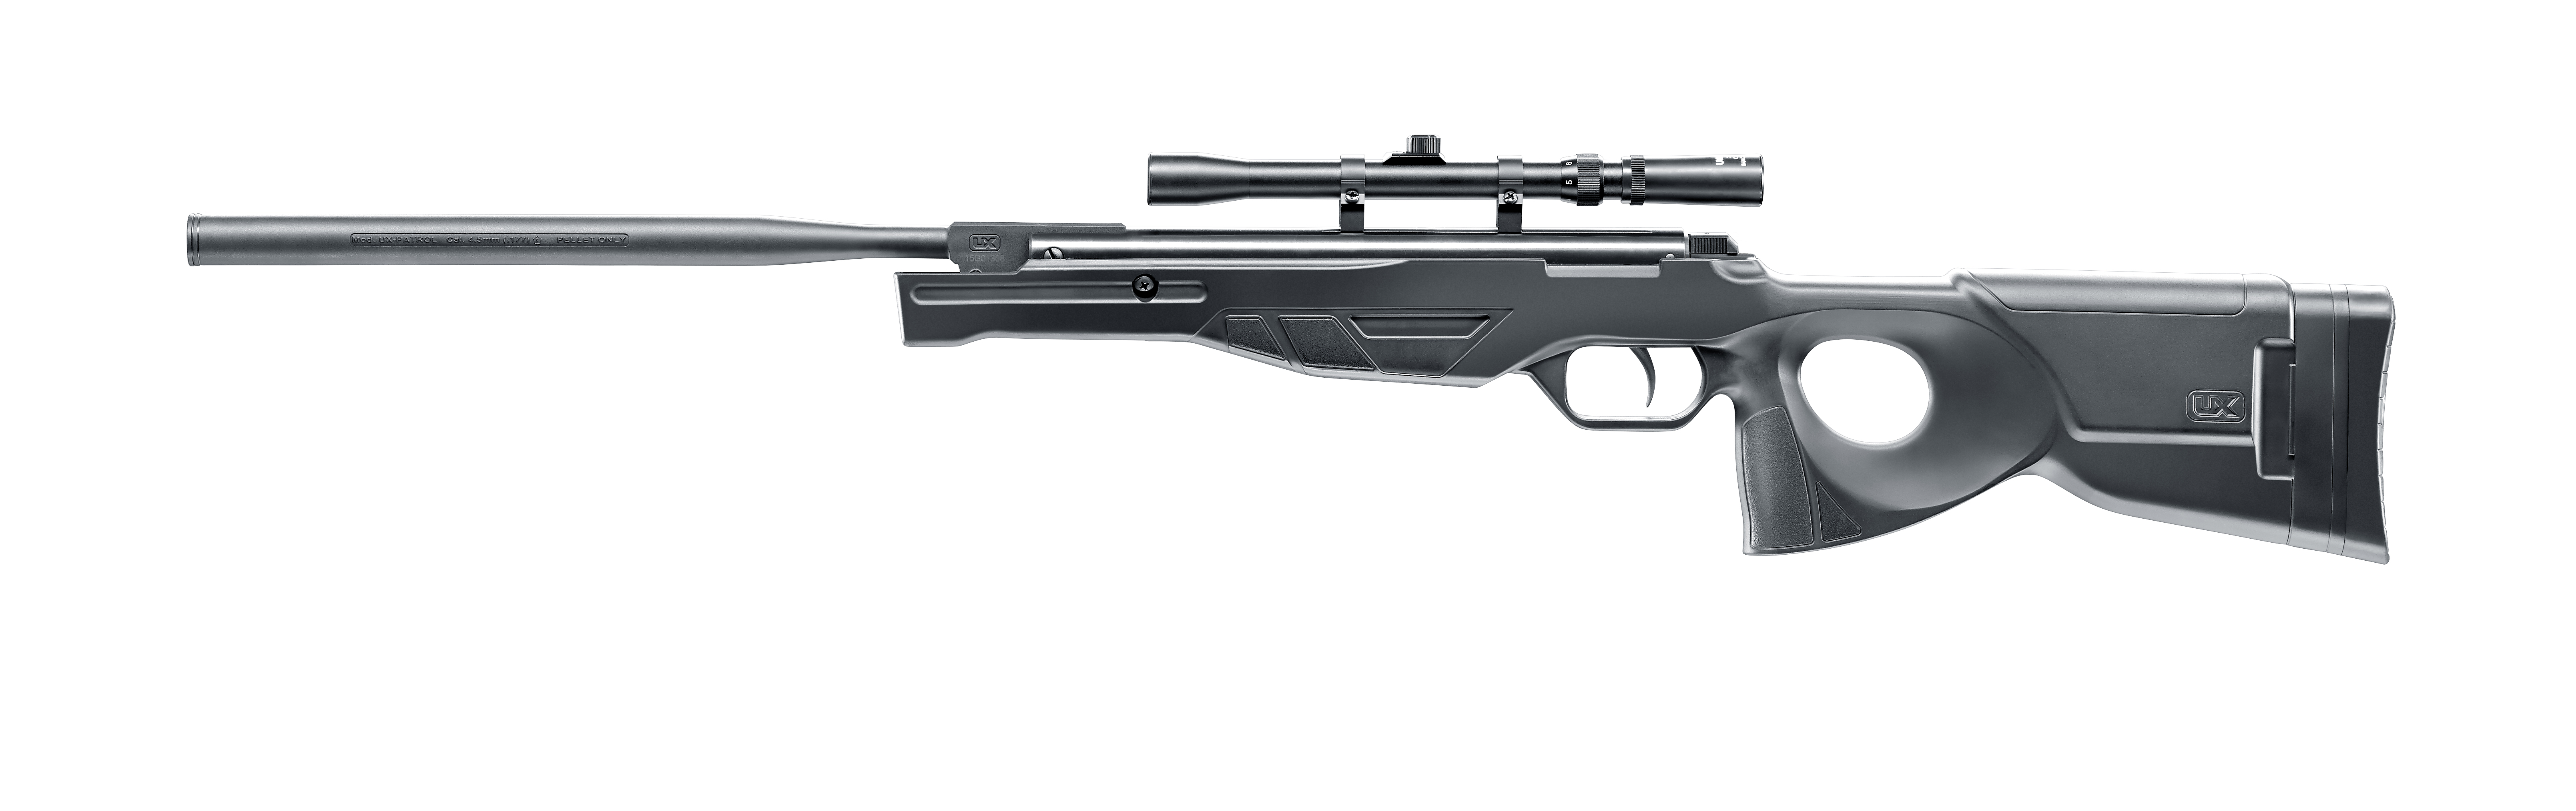 UX (Umarex) Spring Operated Airgun Patrol